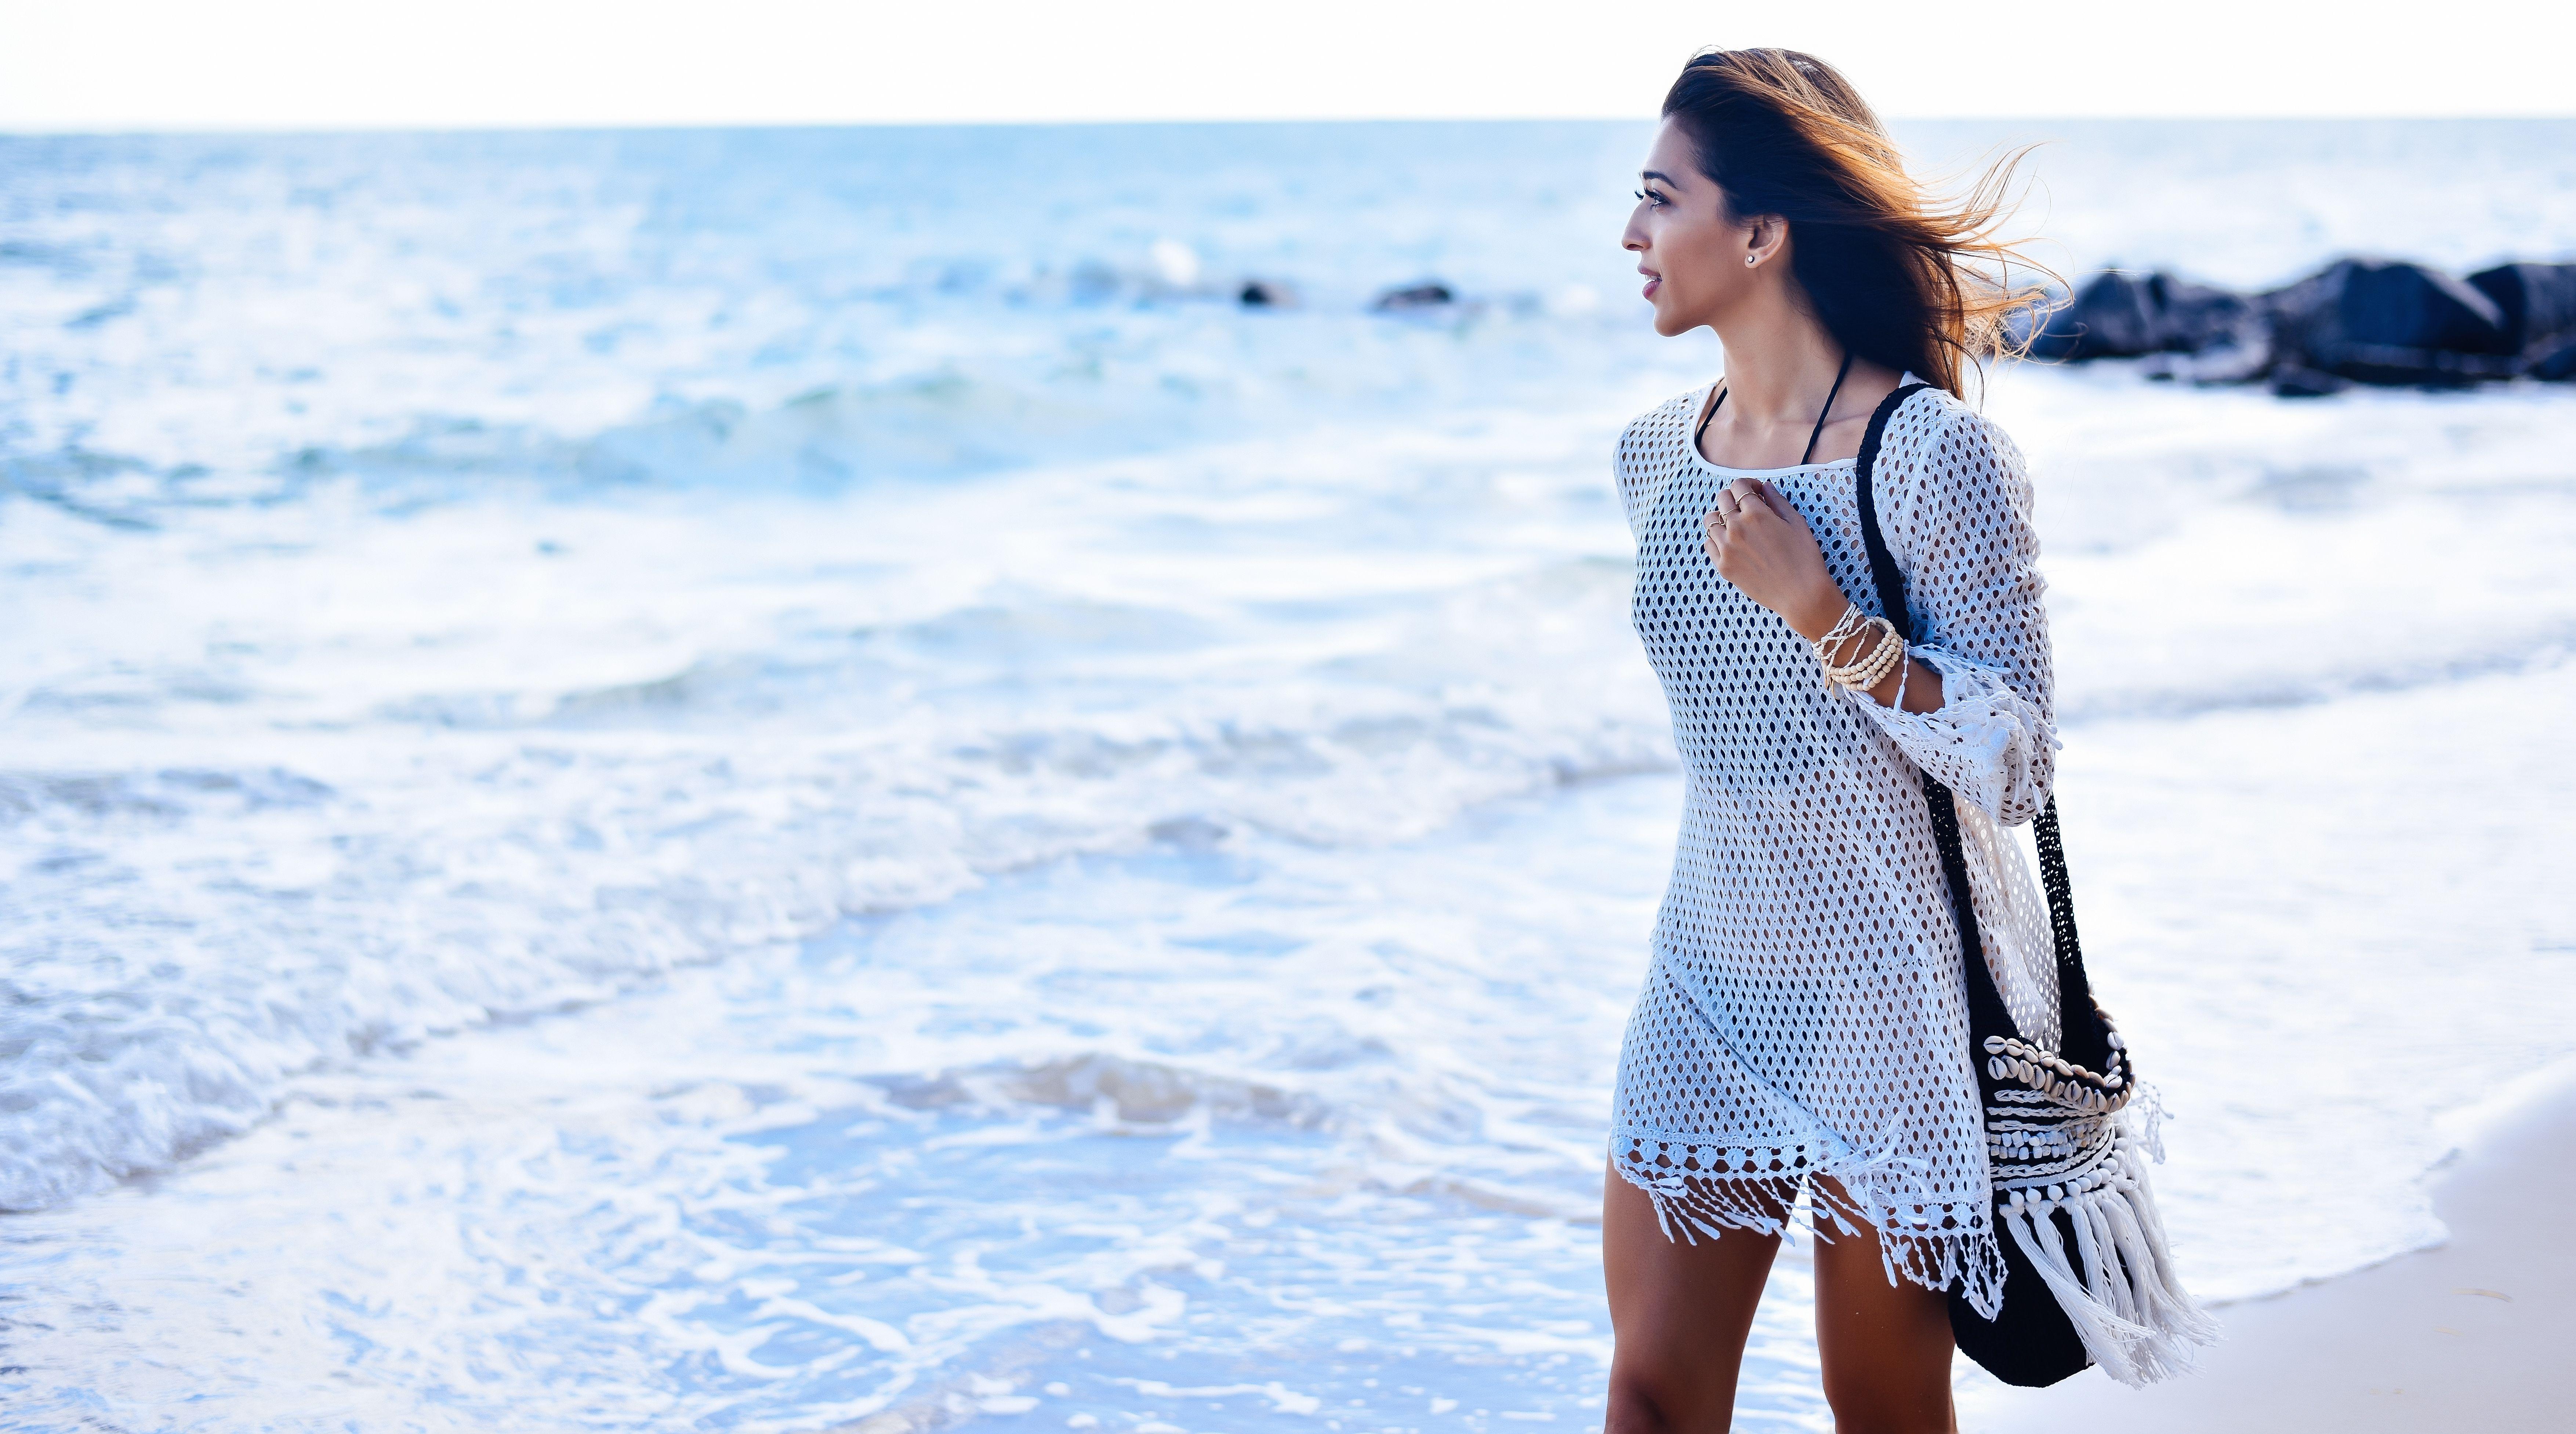 b28902c215 Amita Naithani - beautiful beach coverups   Fashion Brands We Love ...